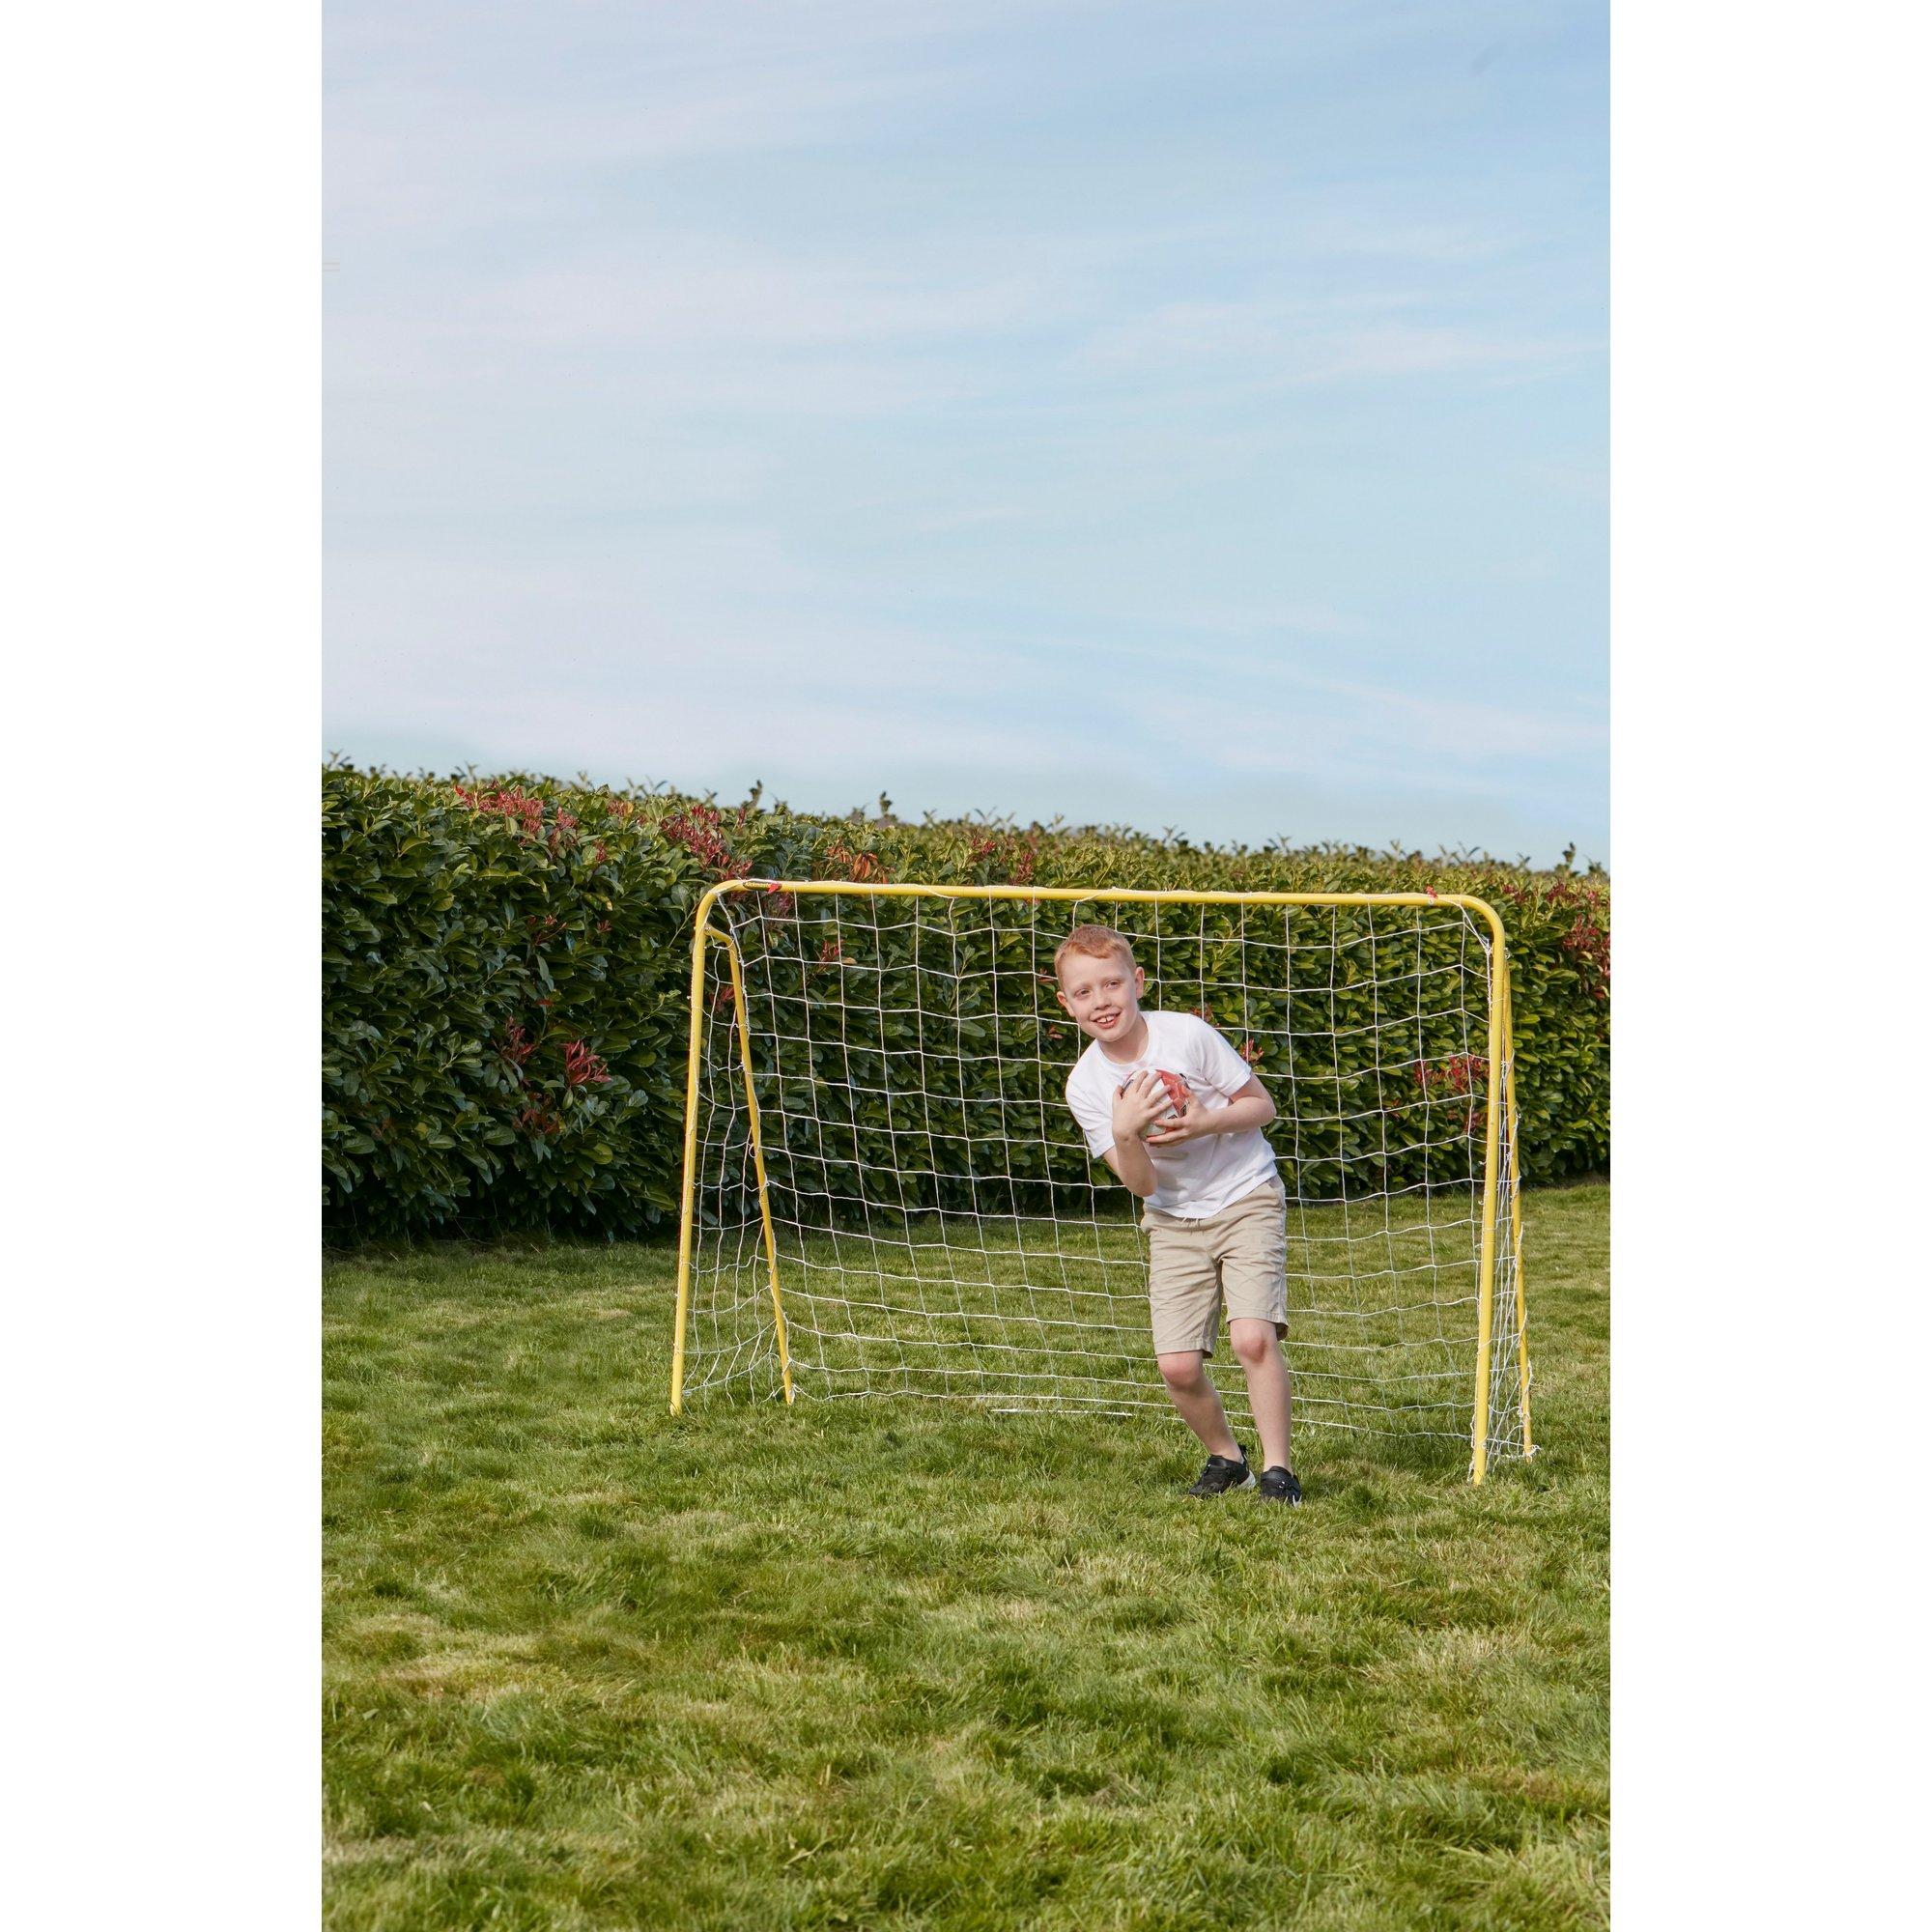 Image of Kickmaster Premier Football Goal